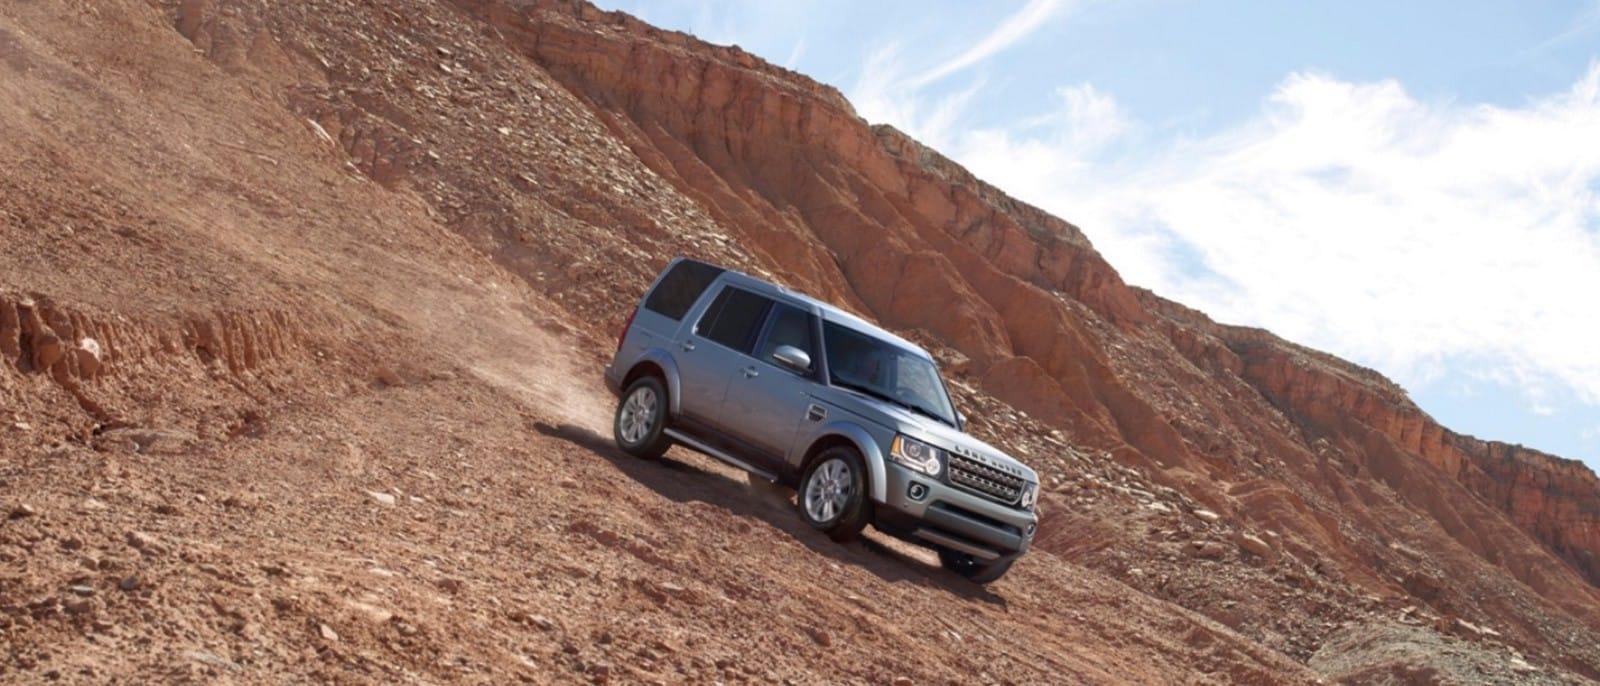 2016-Land-Rover-LR4-Slider-2-1-1600x686